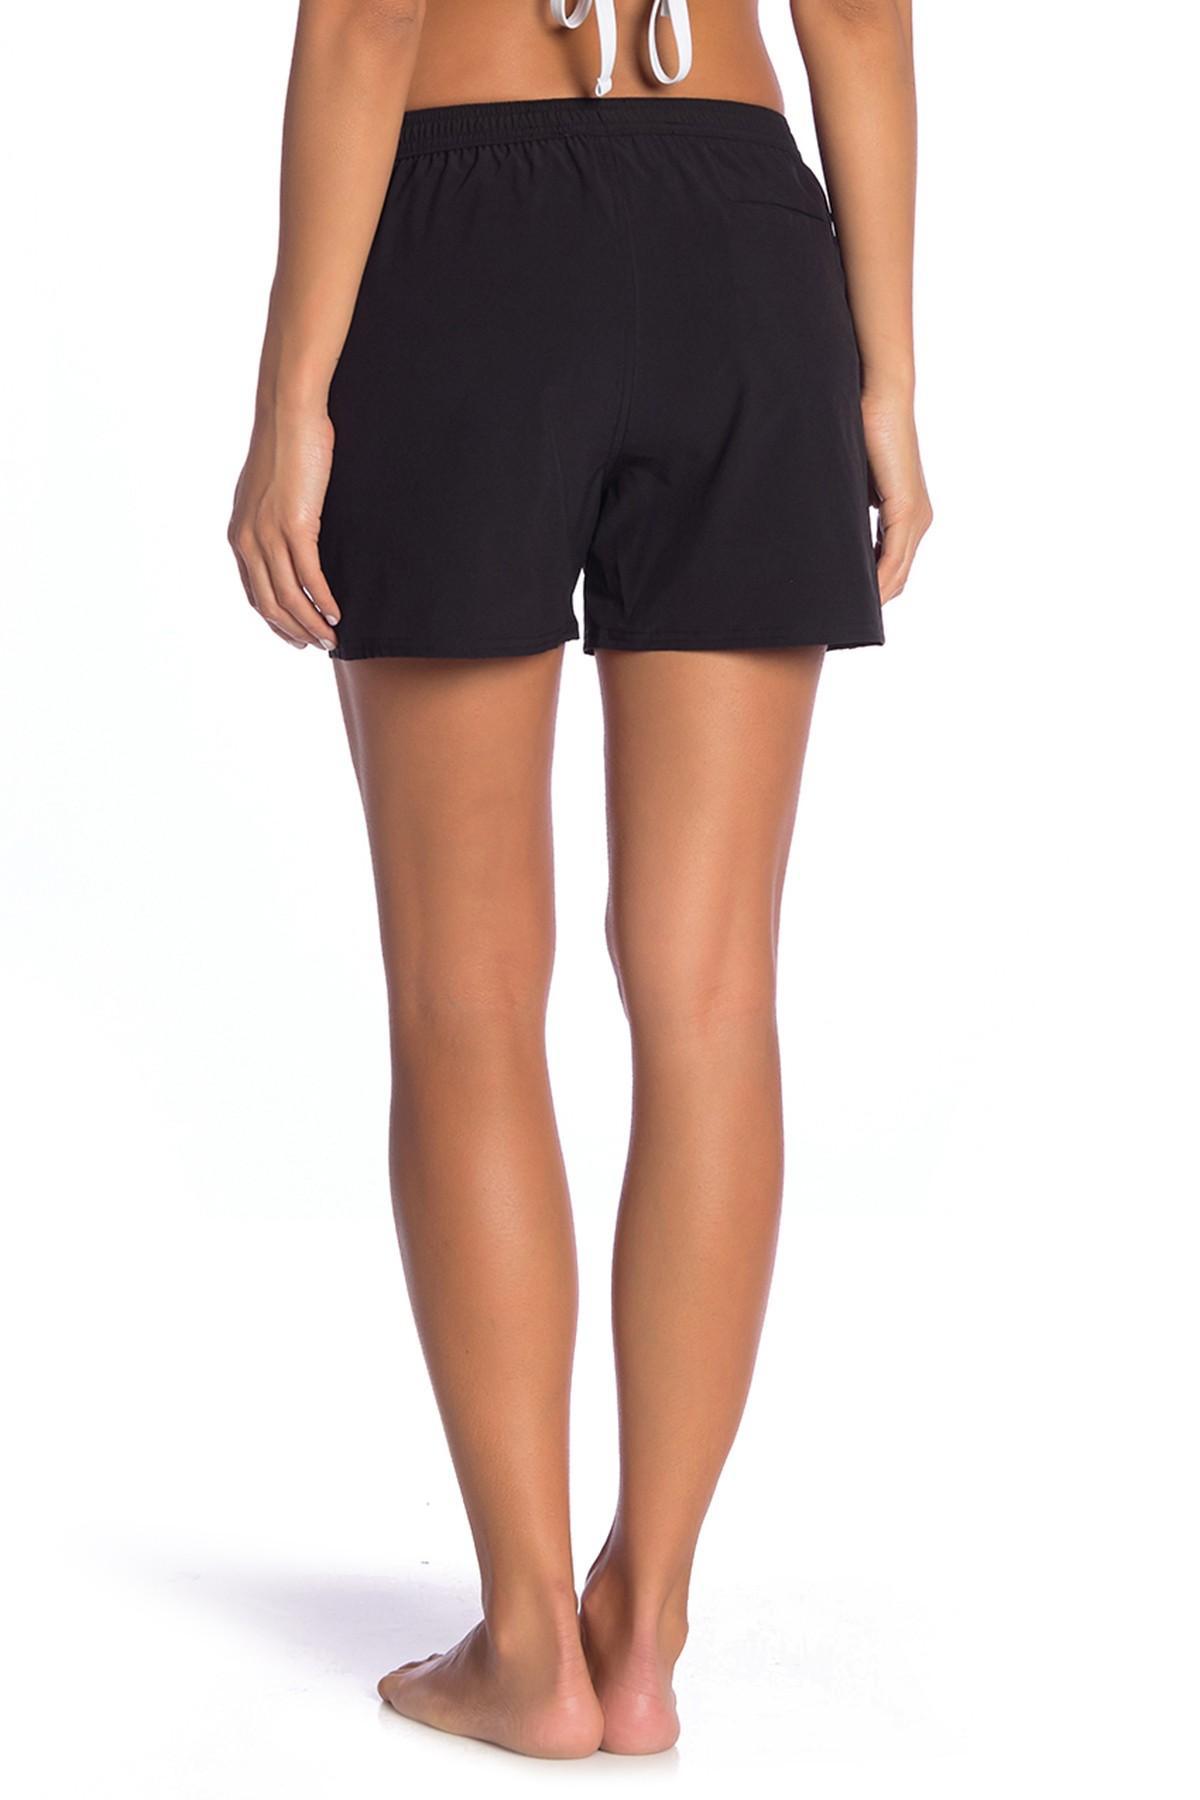 6f775cbd03b11 Adidas - Black Woven Swim Shorts - Lyst. View fullscreen